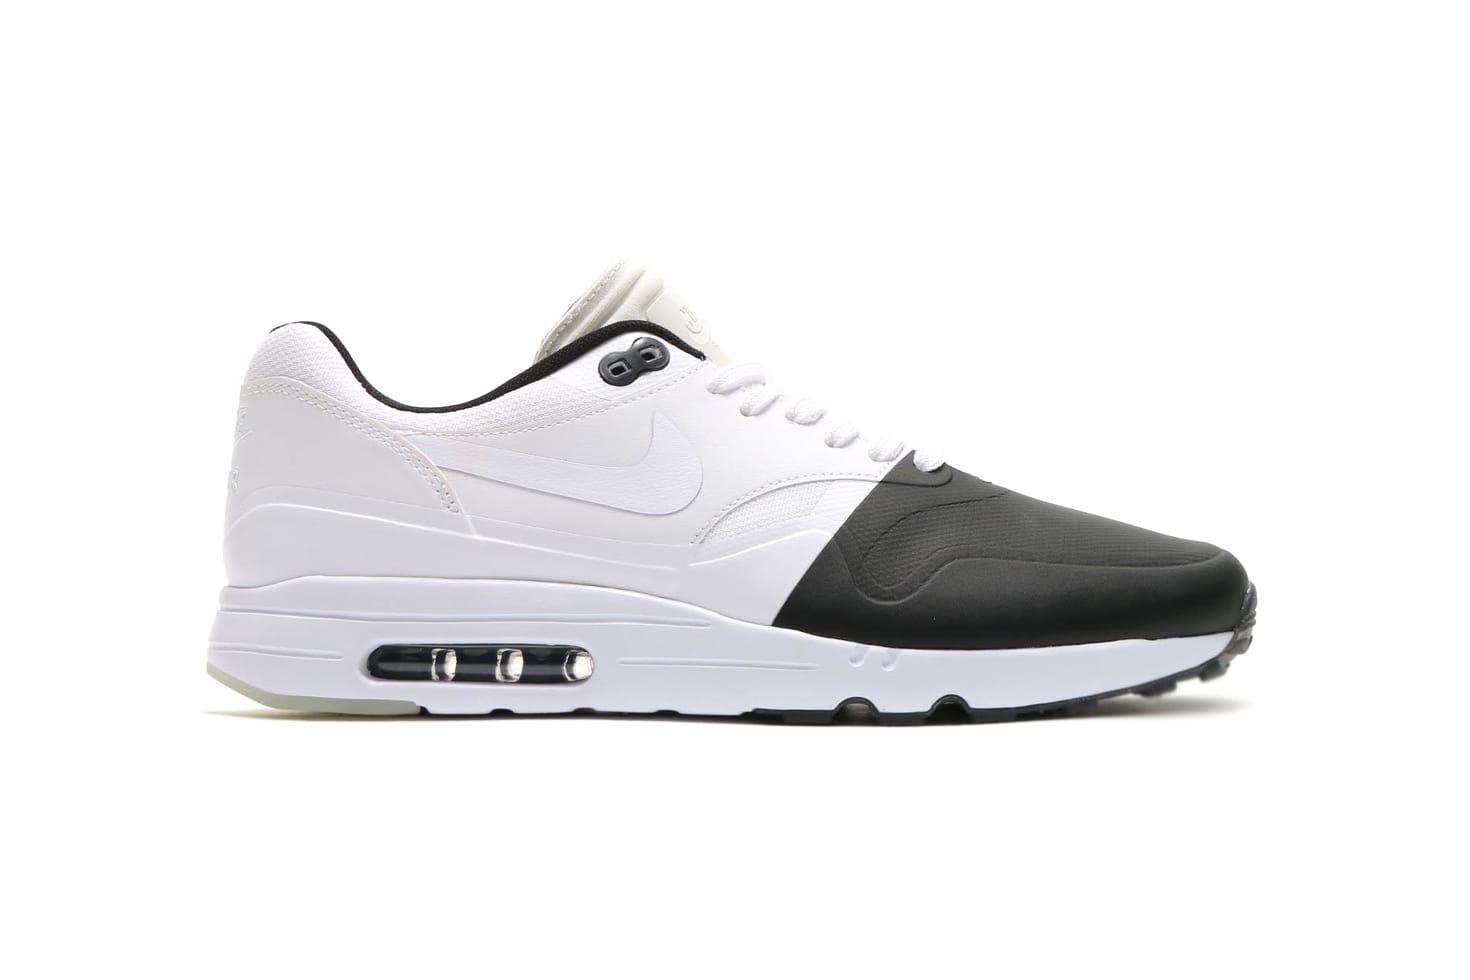 Nike Air Max 1 Ultra 2.0 SE in Black